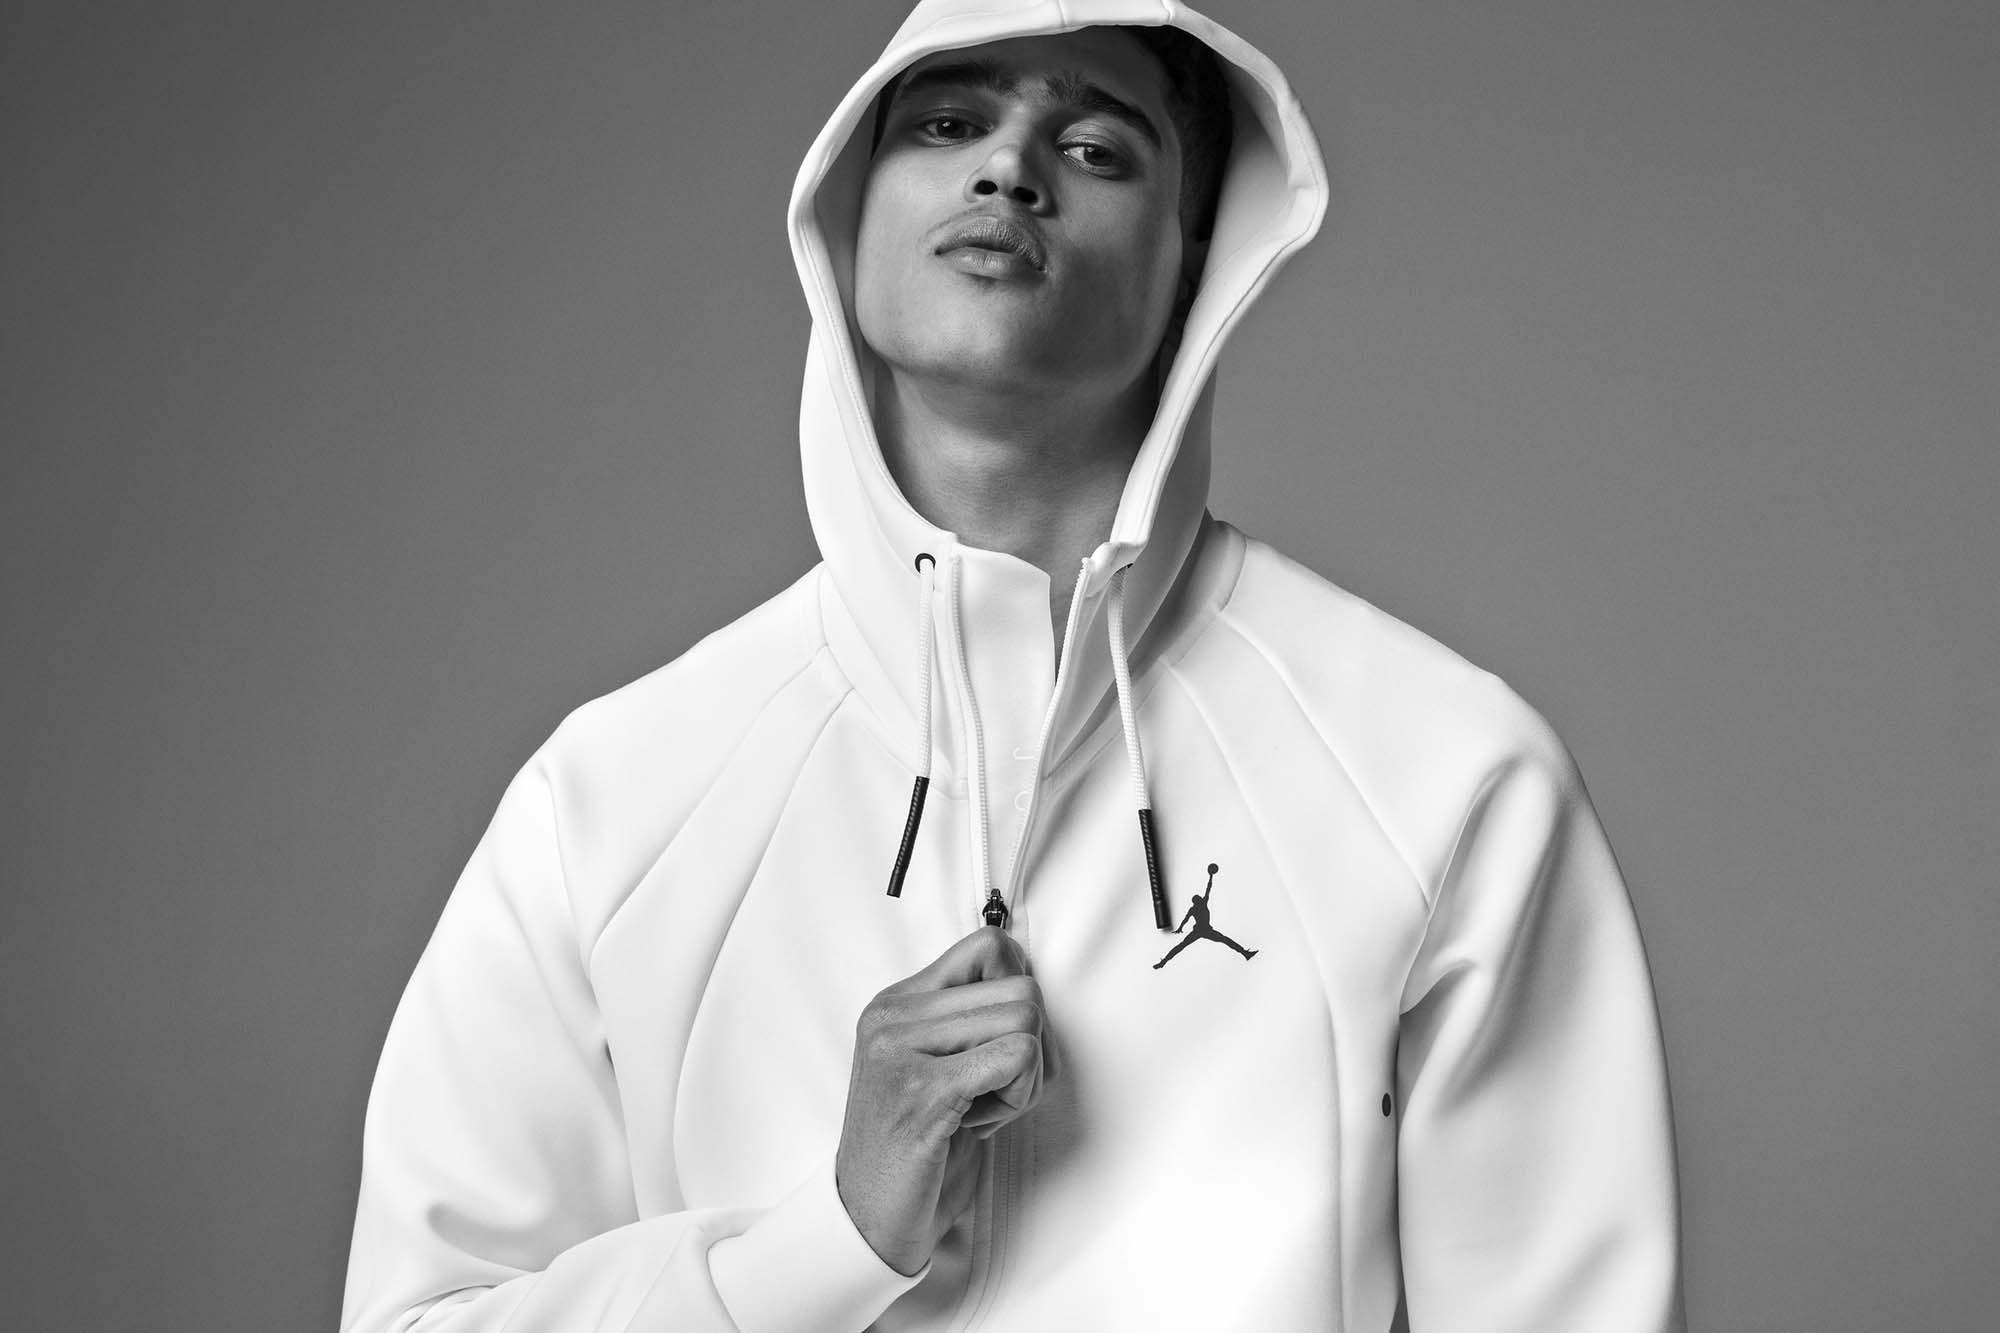 jordan-brand-2017-aw-clothing-collection-005